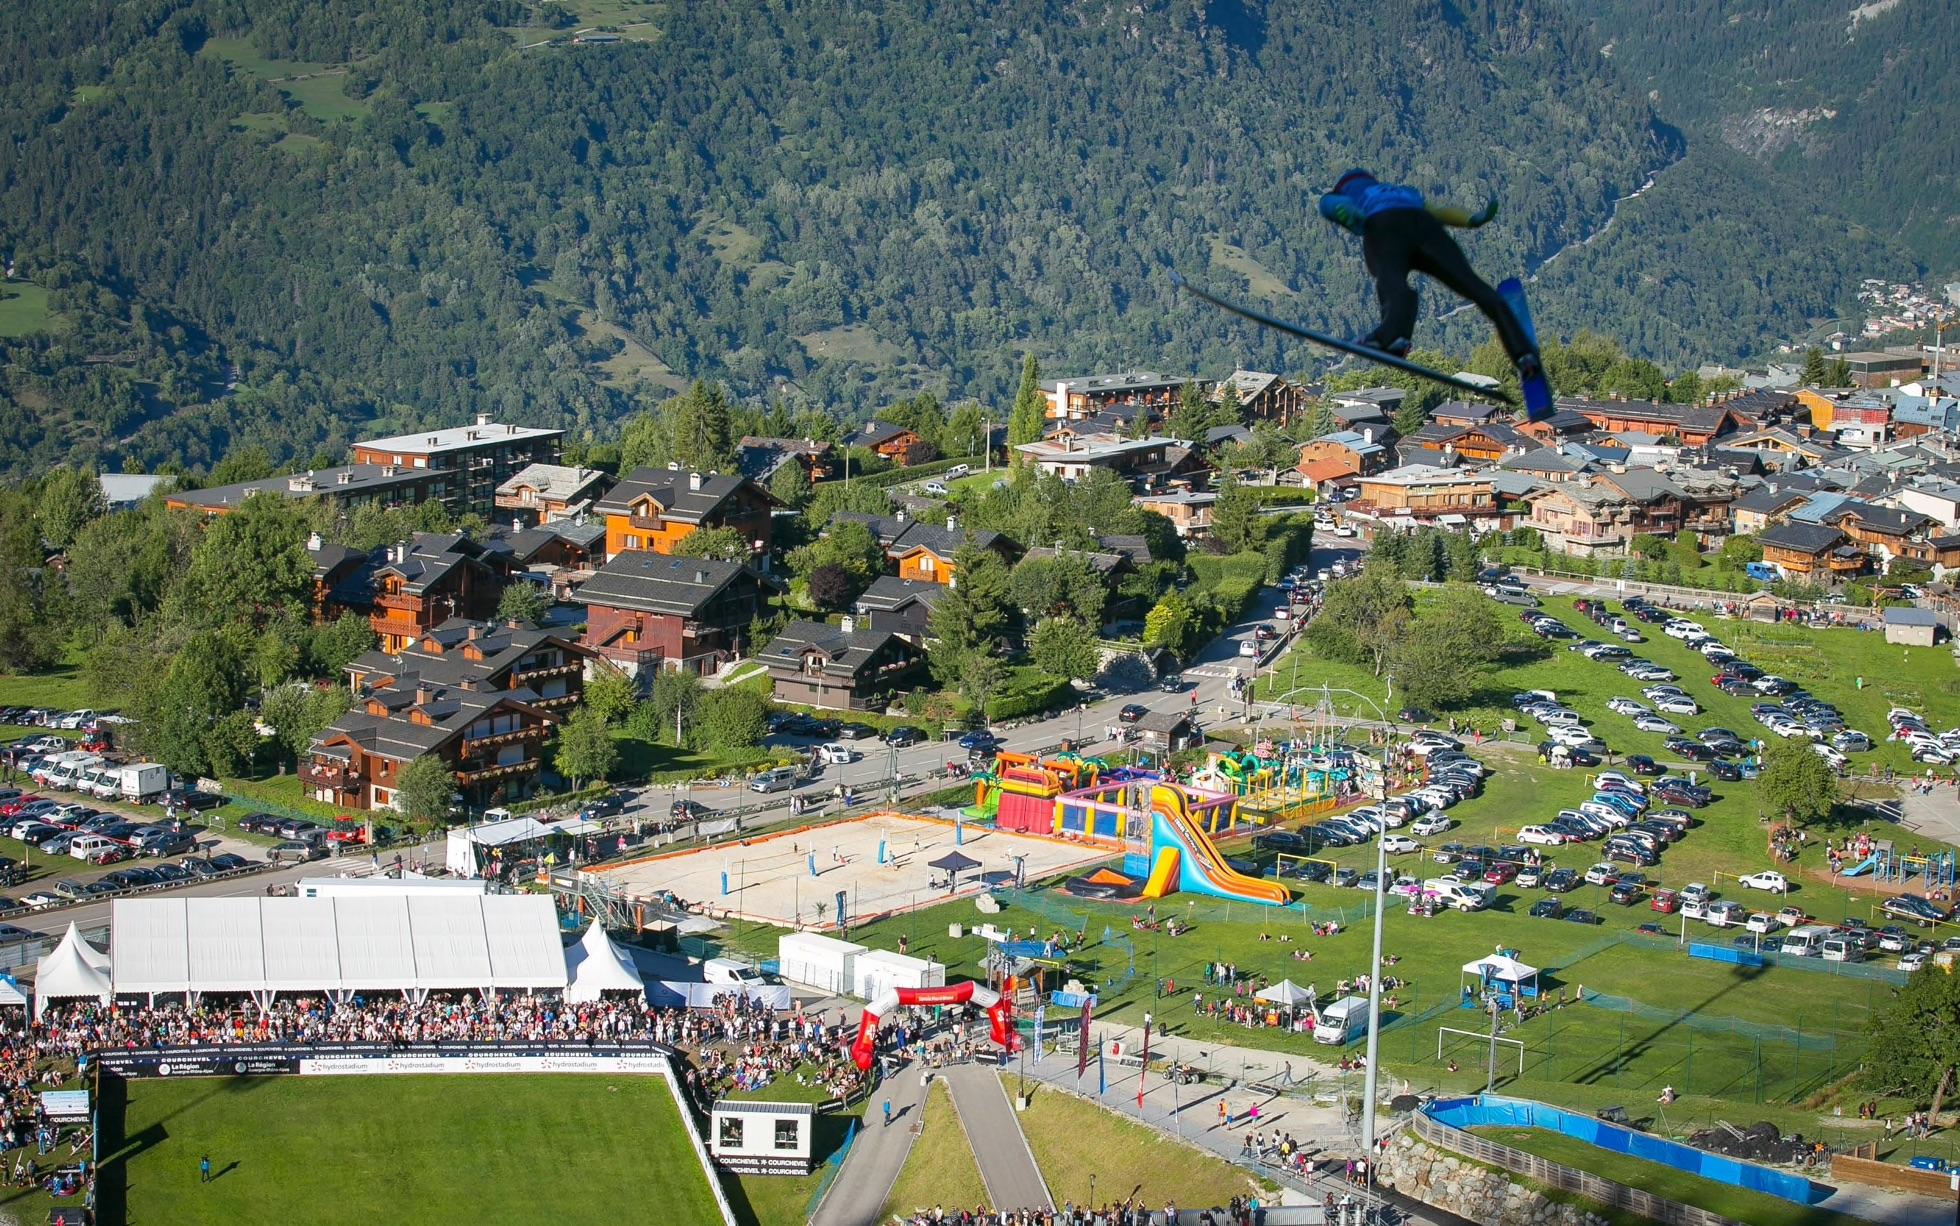 courchevel-ski-jump-COURCHEVE-TOURISME.jpg